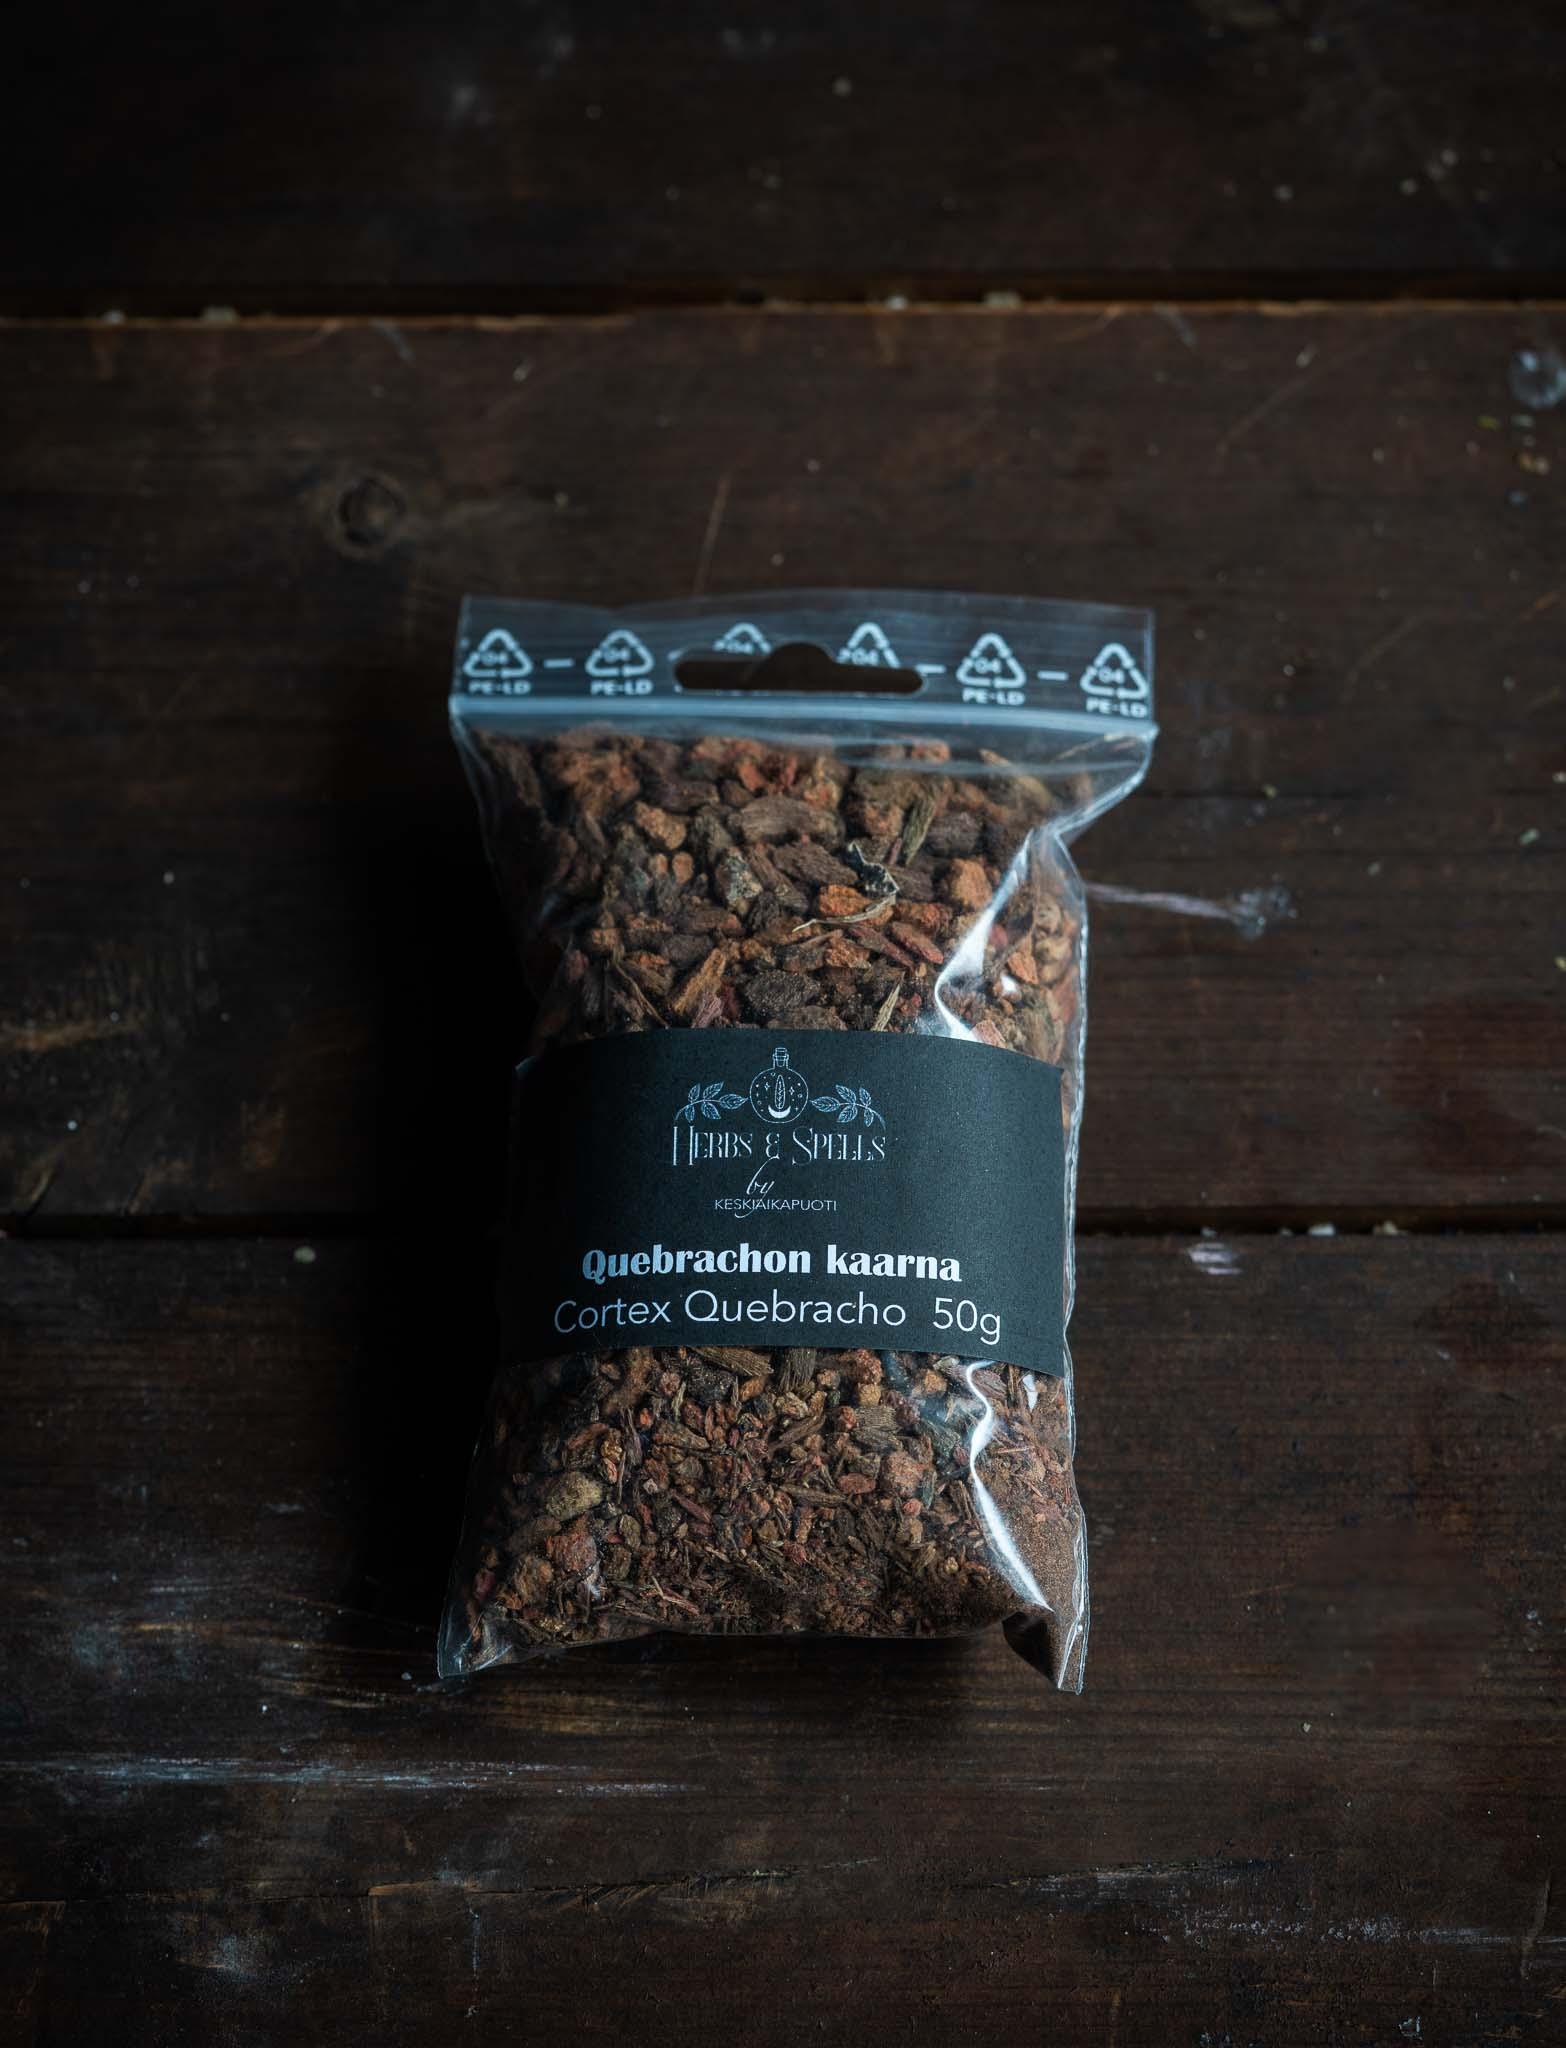 Quebrachon kaarnaa - Cortex Quebracho 50g (Herbs&Spell by keskiaikapuoti)